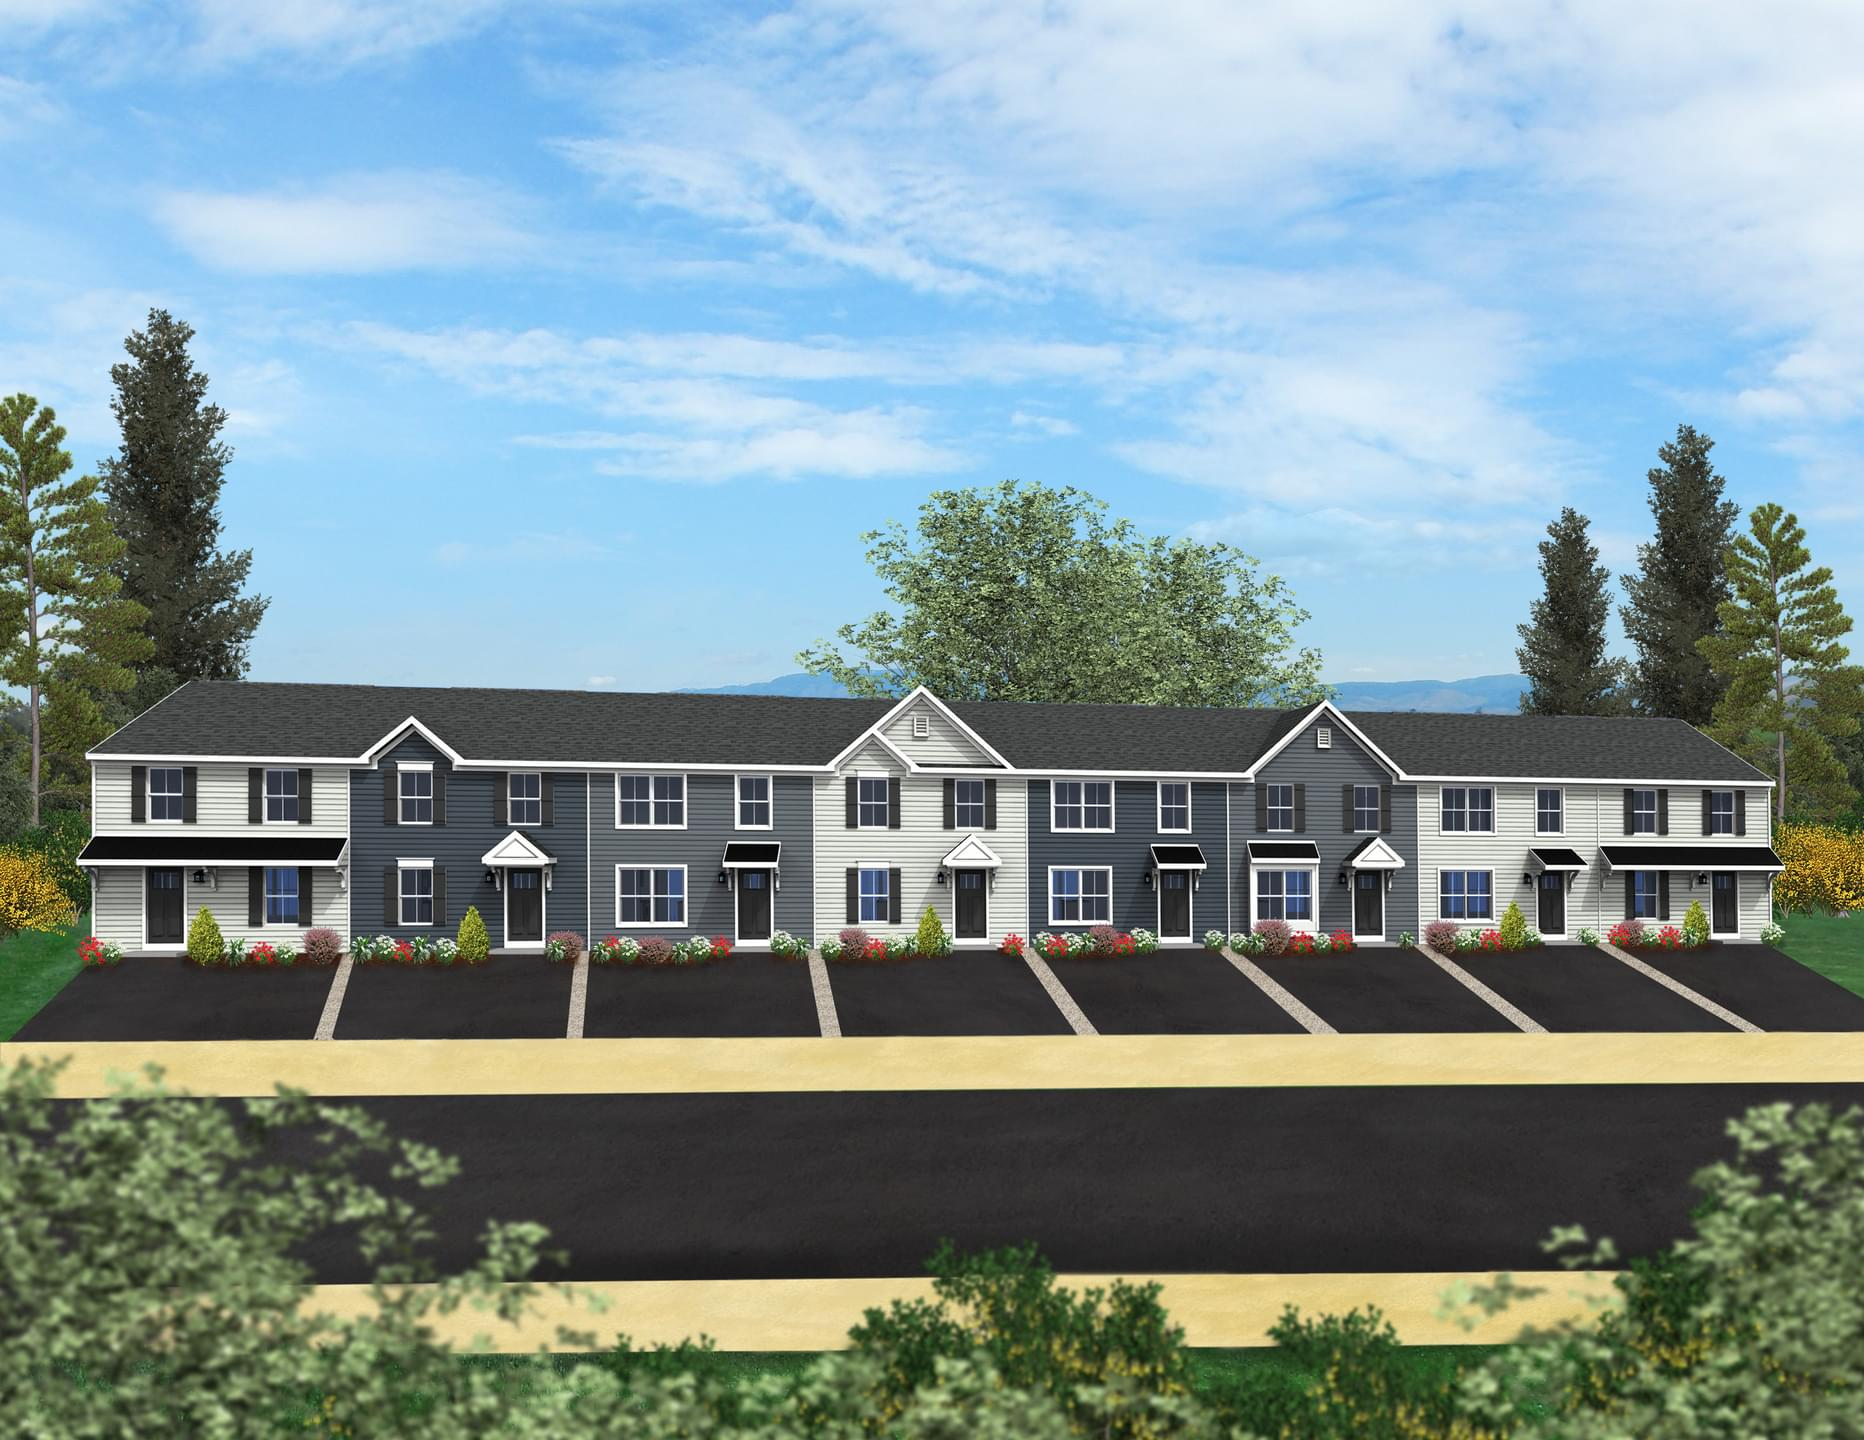 Berks Homes in Lot#9 4305 FORBES DR, Stewartstown, PA 17363 PA